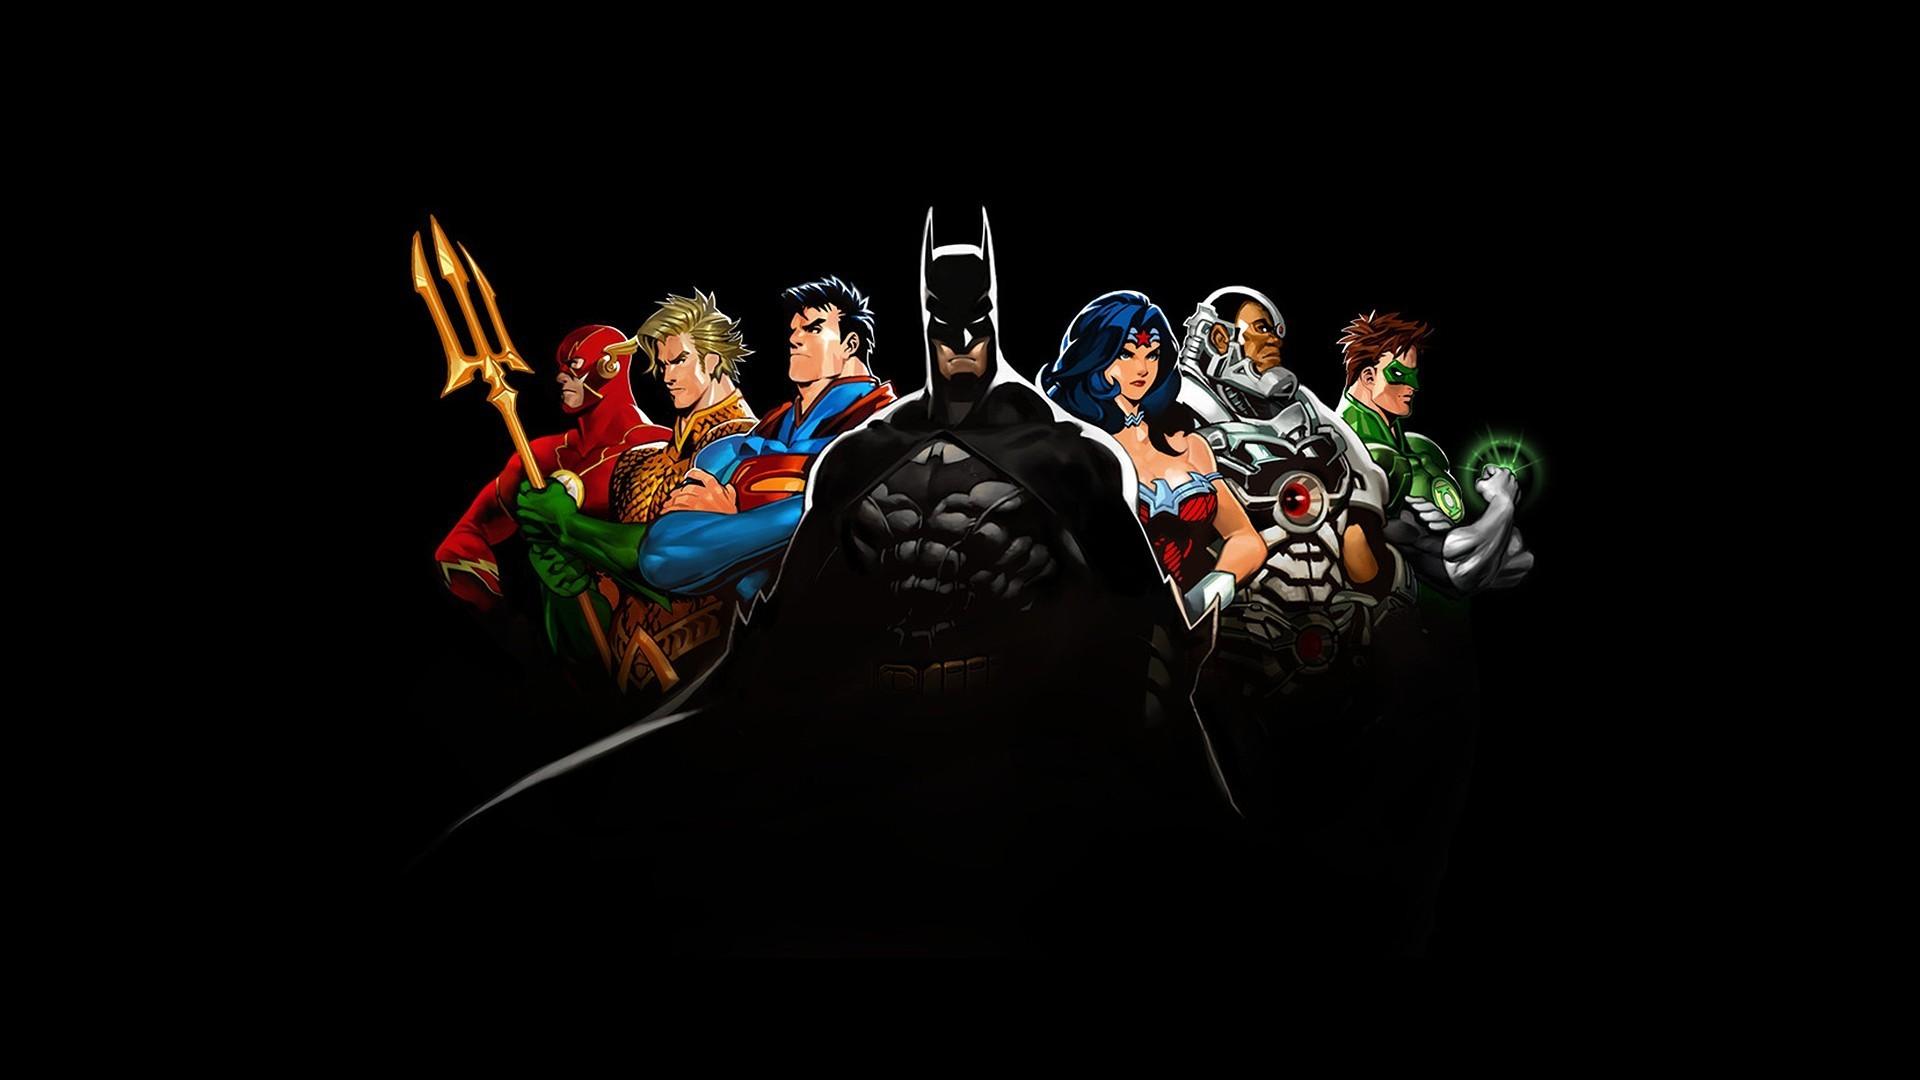 dc-comics-heroes-comic-hd-wallpaper-1920×1080-5068.